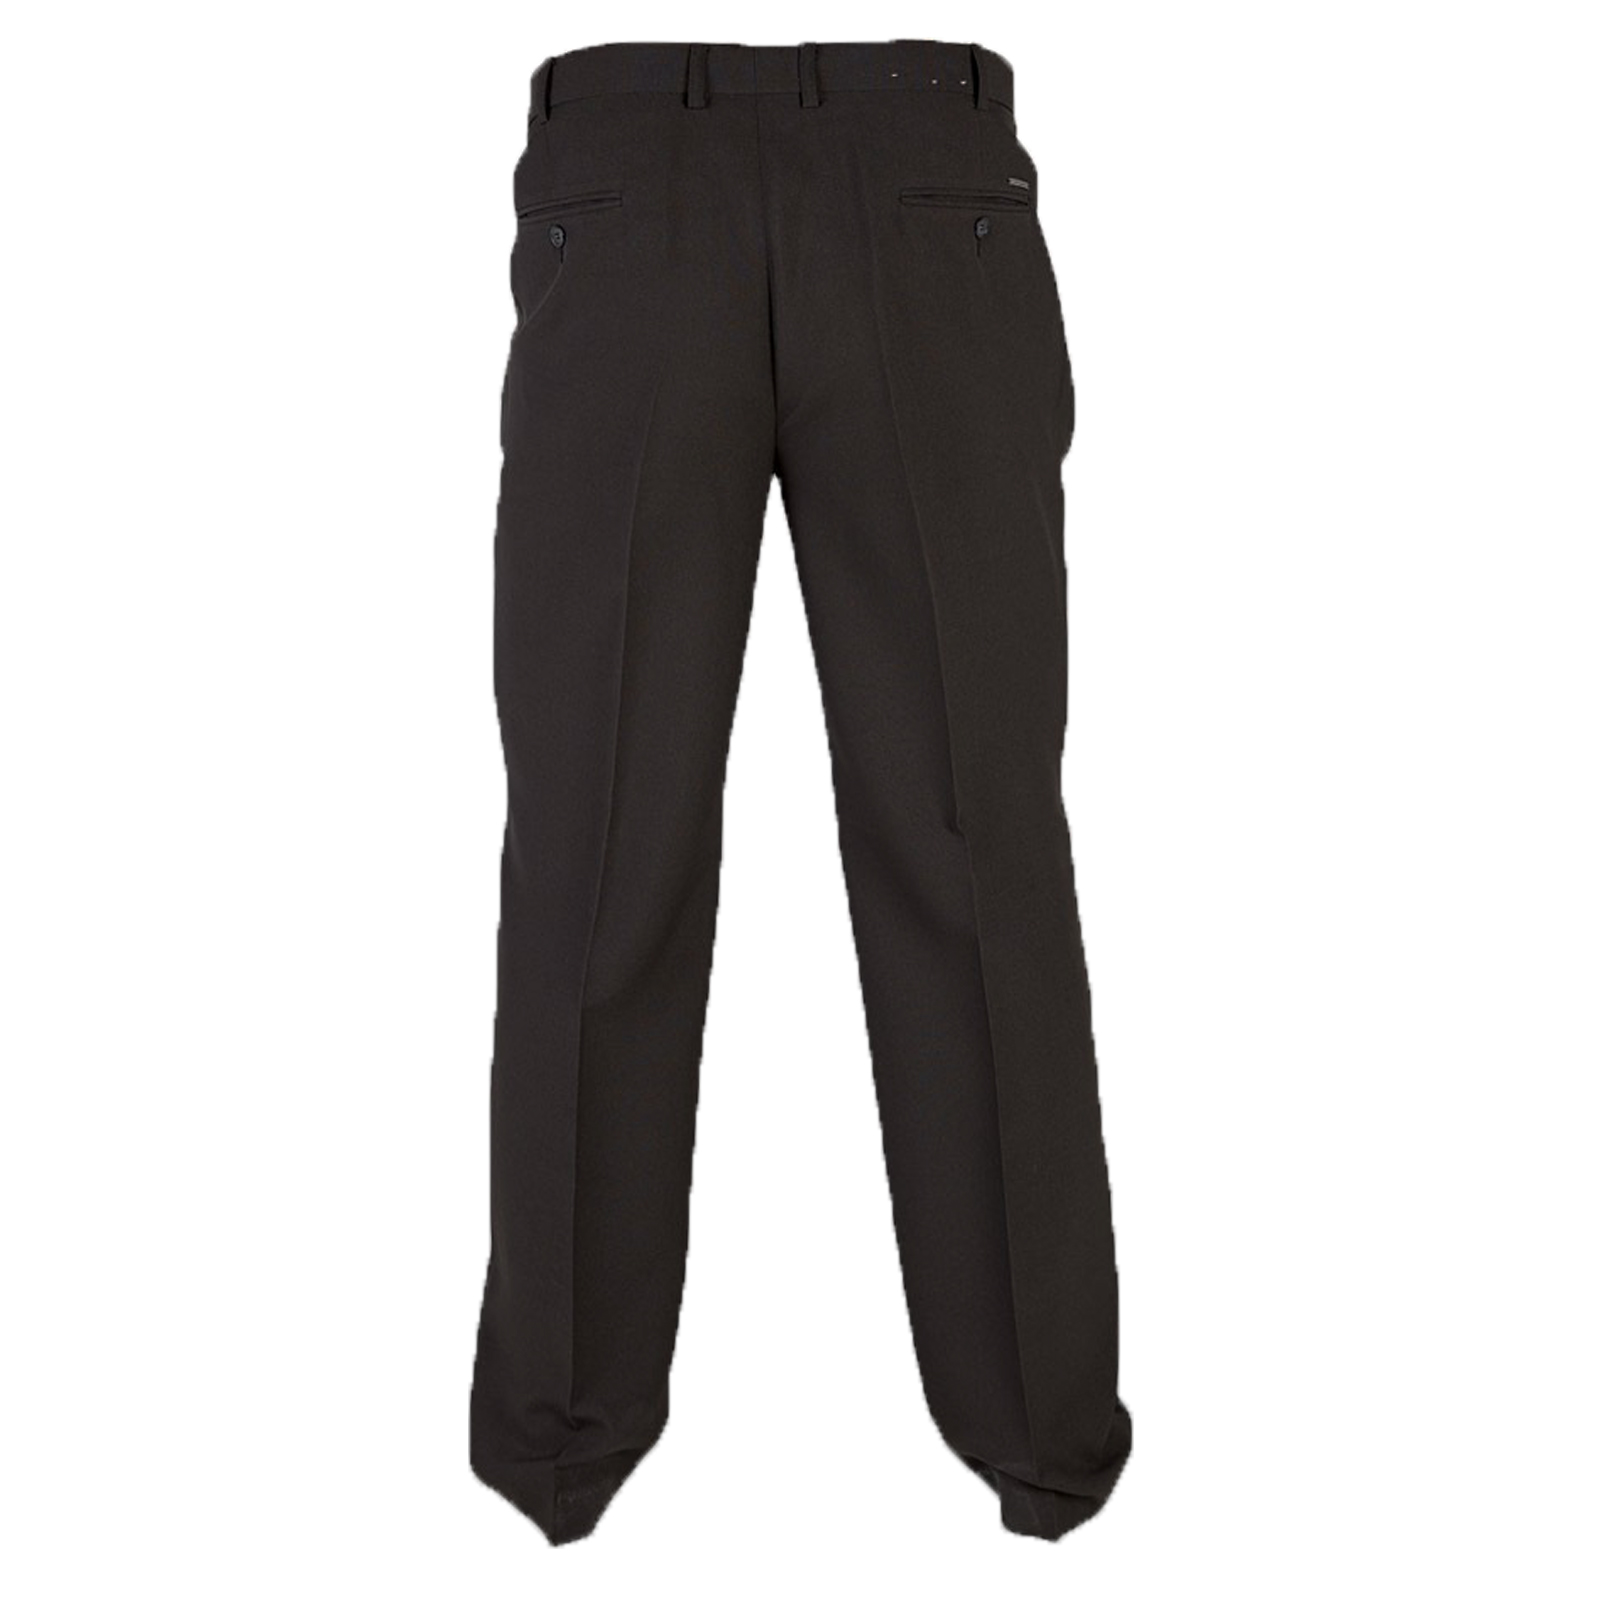 Duke-D555-Big-King-Size-Mens-Trousers-Xtenda-Adjustable-Waist-Smart-Casual-Pants thumbnail 3